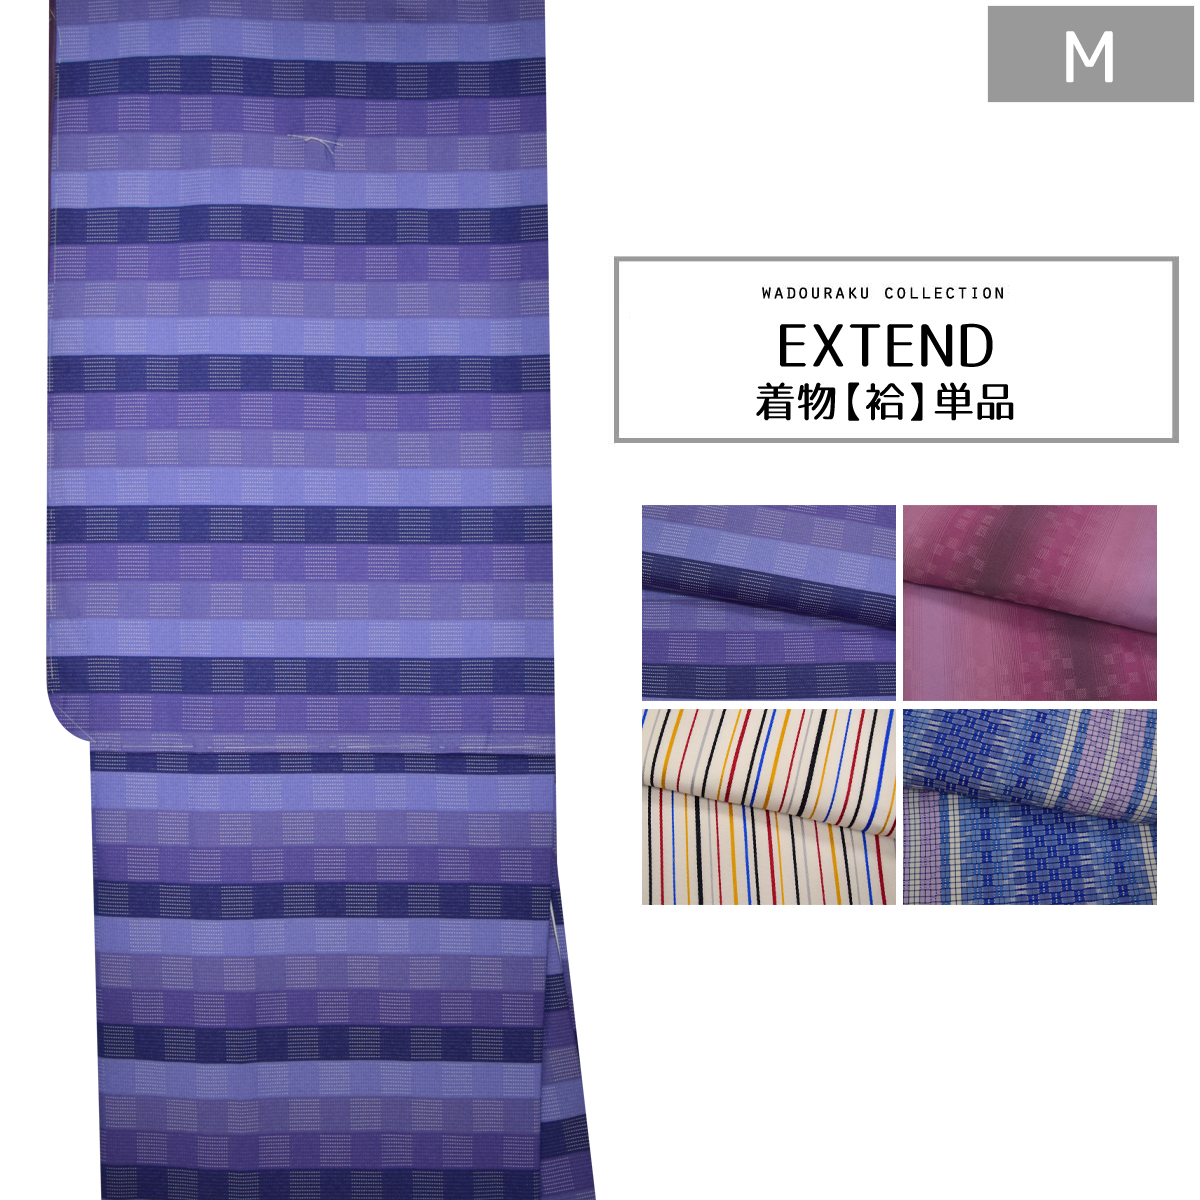 【EXTEND】選べる 洗える着物 袷 単品 Мサイズ【大人モダン】普段着 お洒落 黒 紫 青番号f1216-201